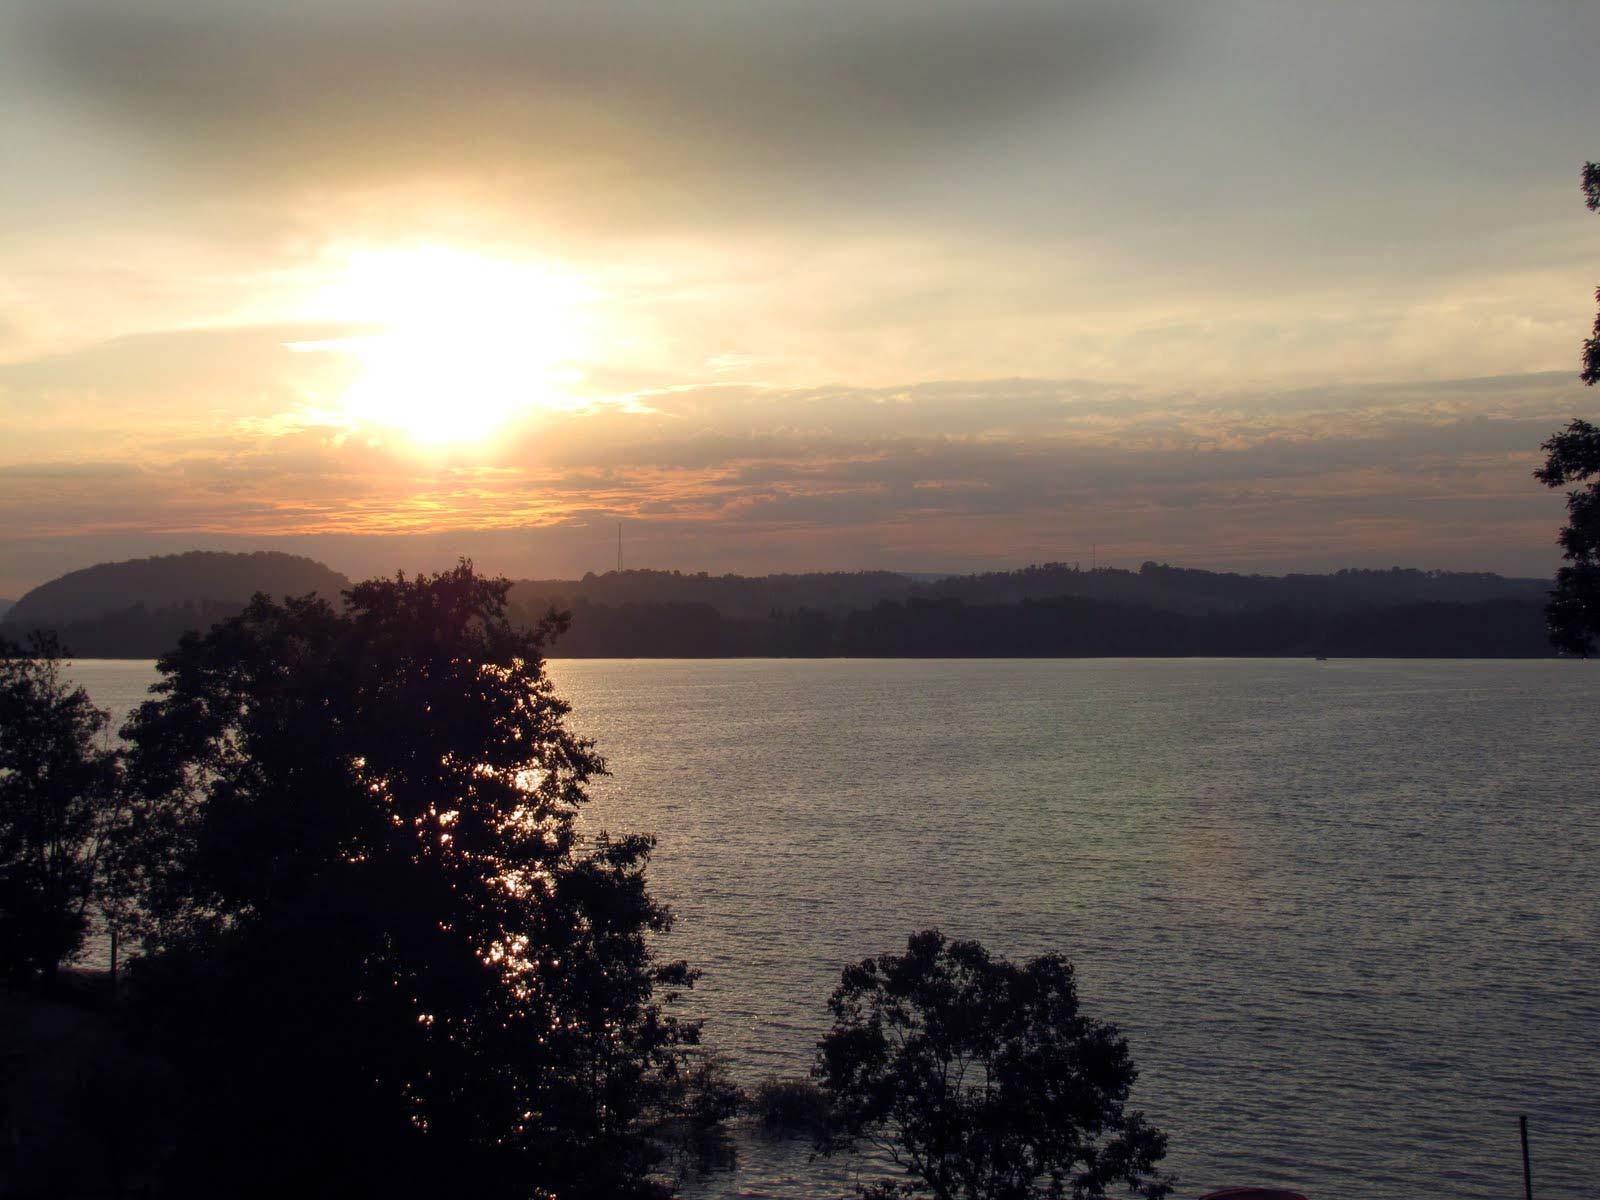 cherokee lake cherokee lake tennessee cherokee